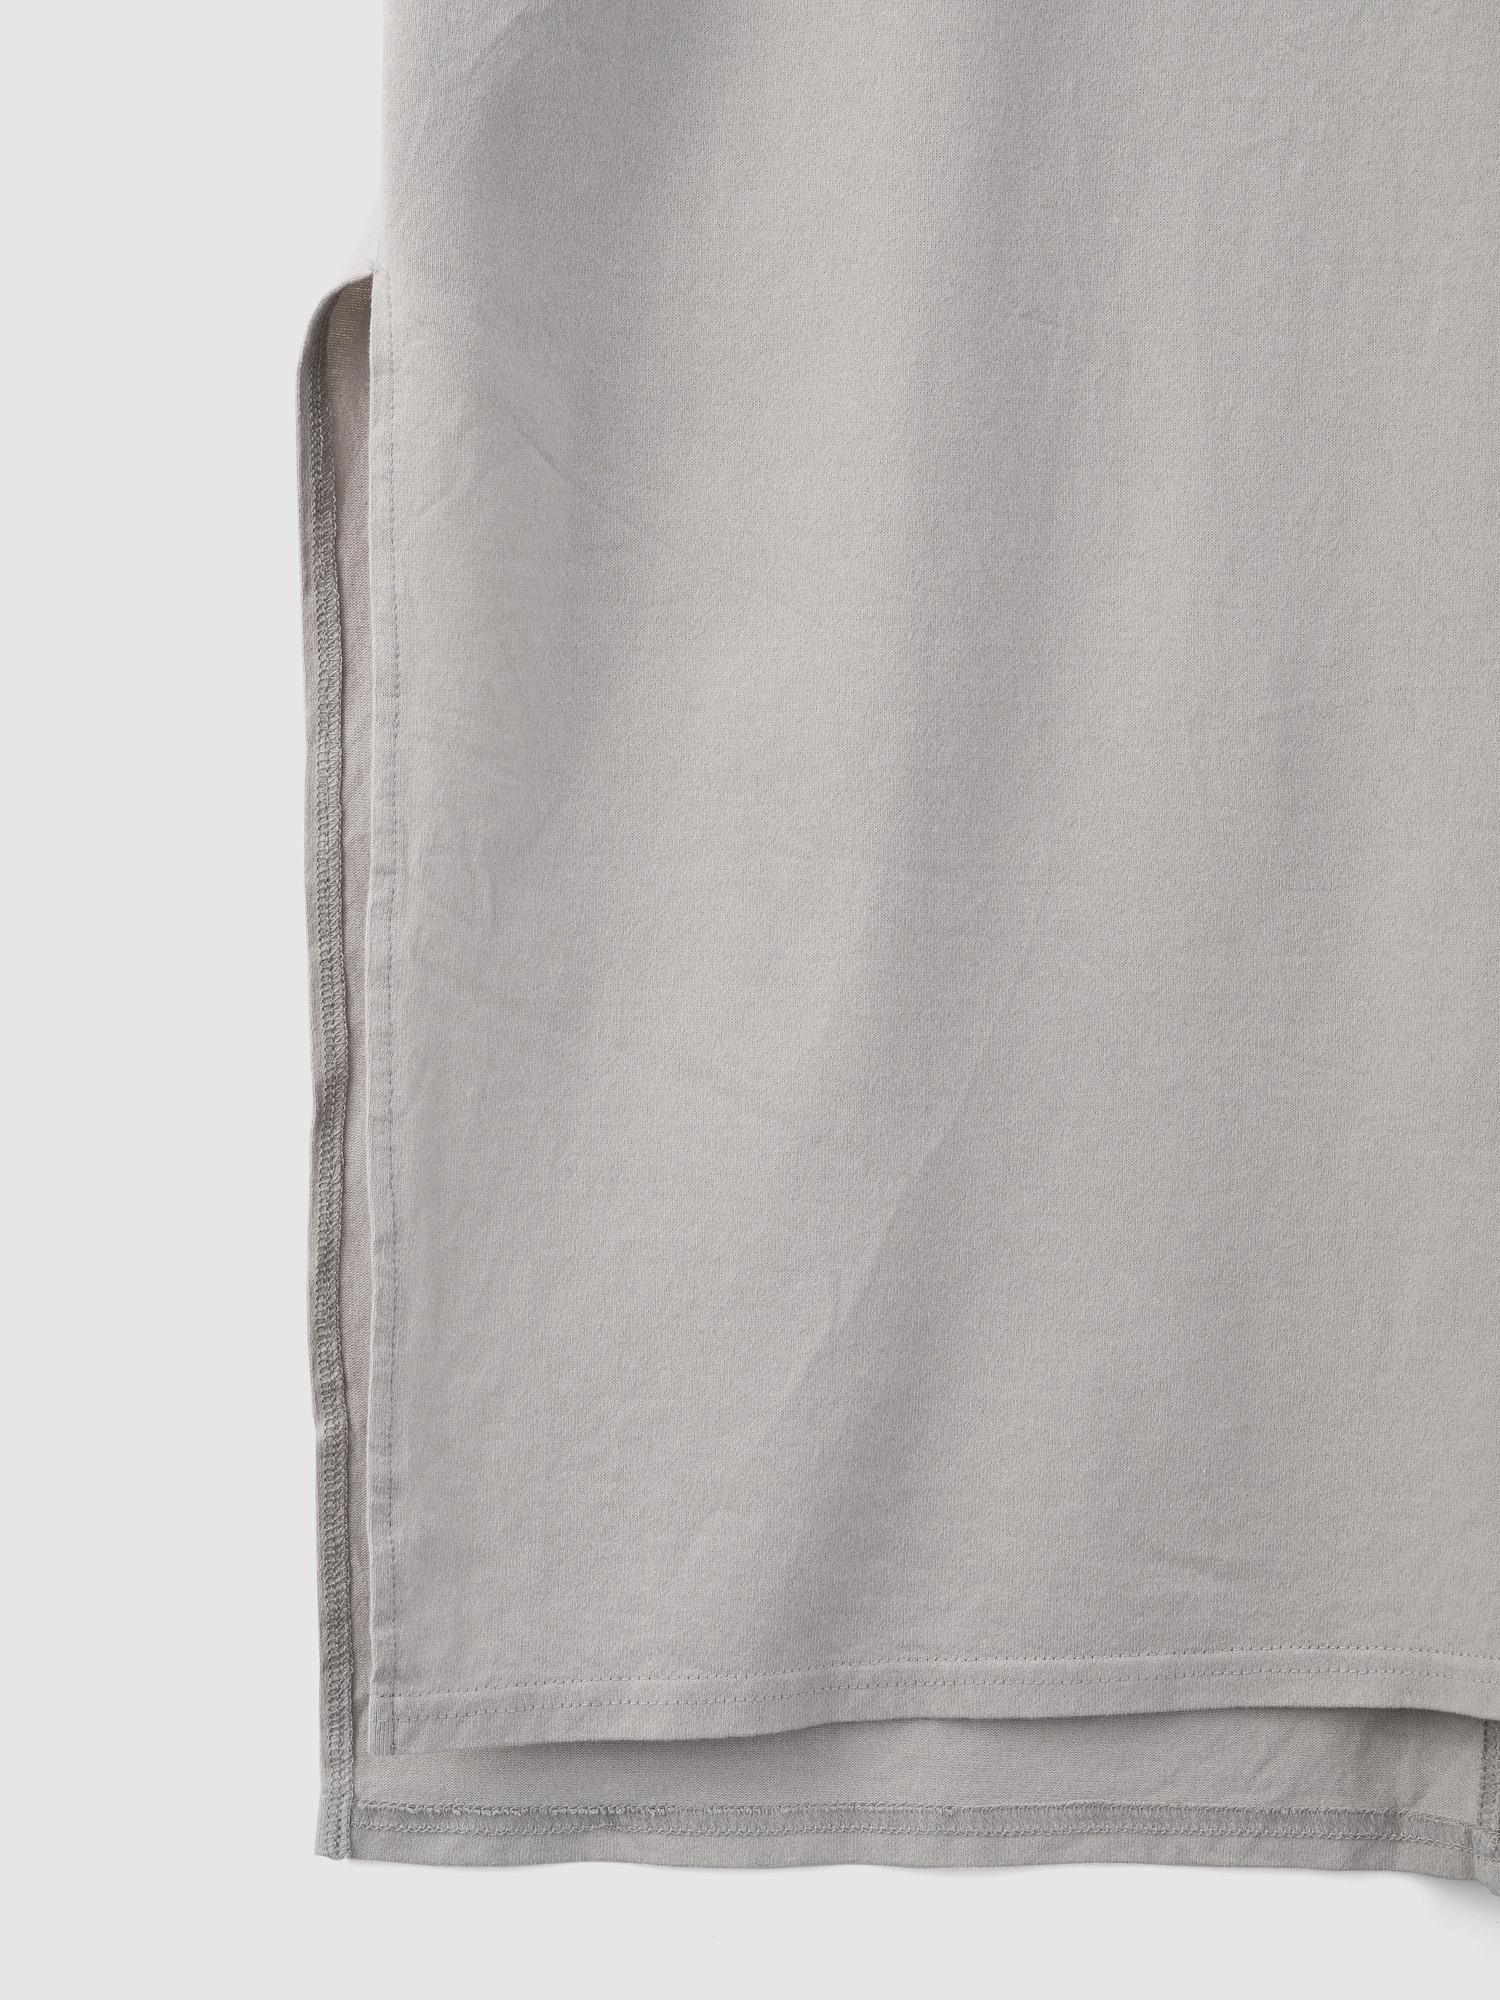 Women's COMFORT DRESS TUNIC T-SHIRTのサムネイル8